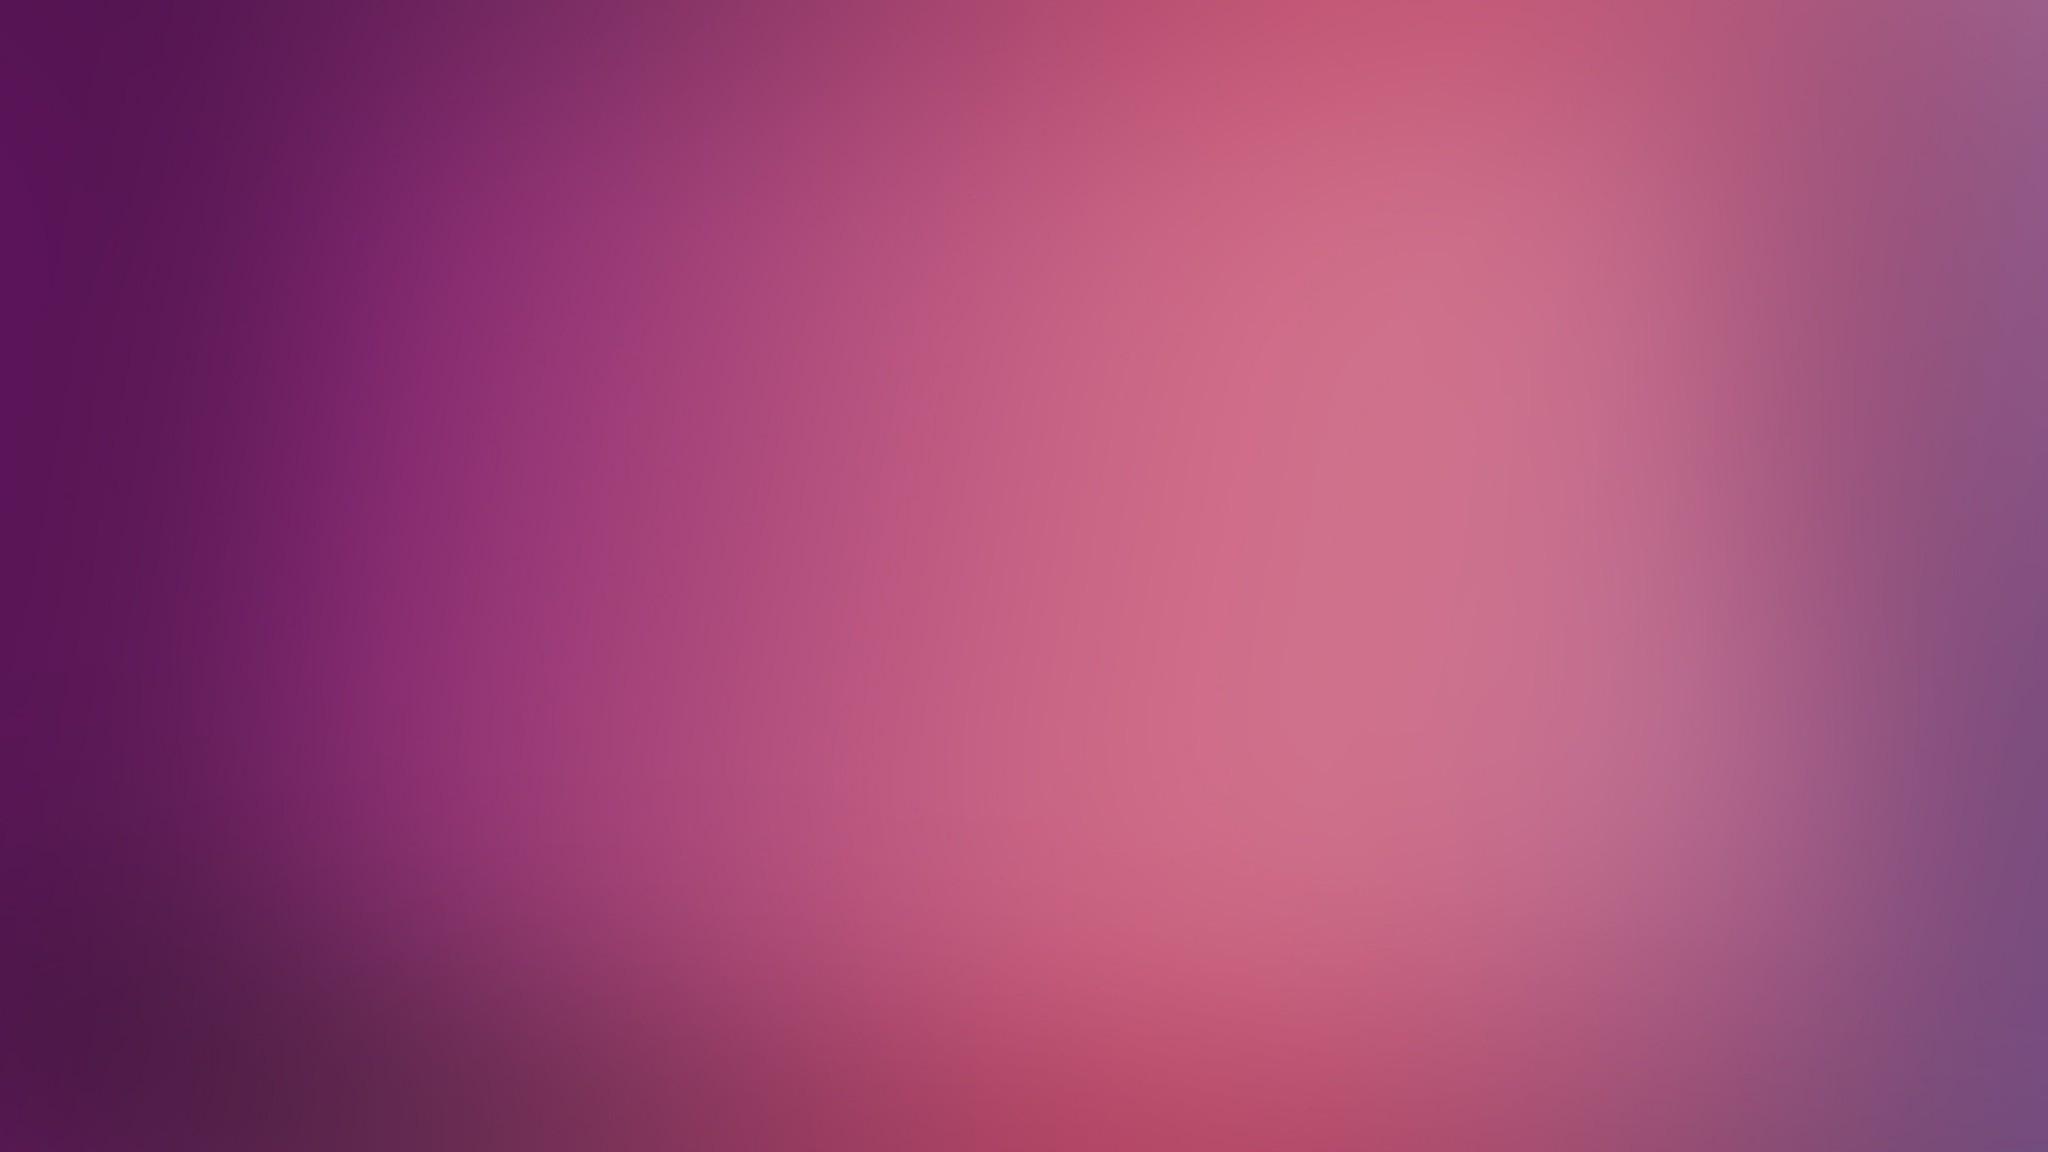 Обои лавандового цвета